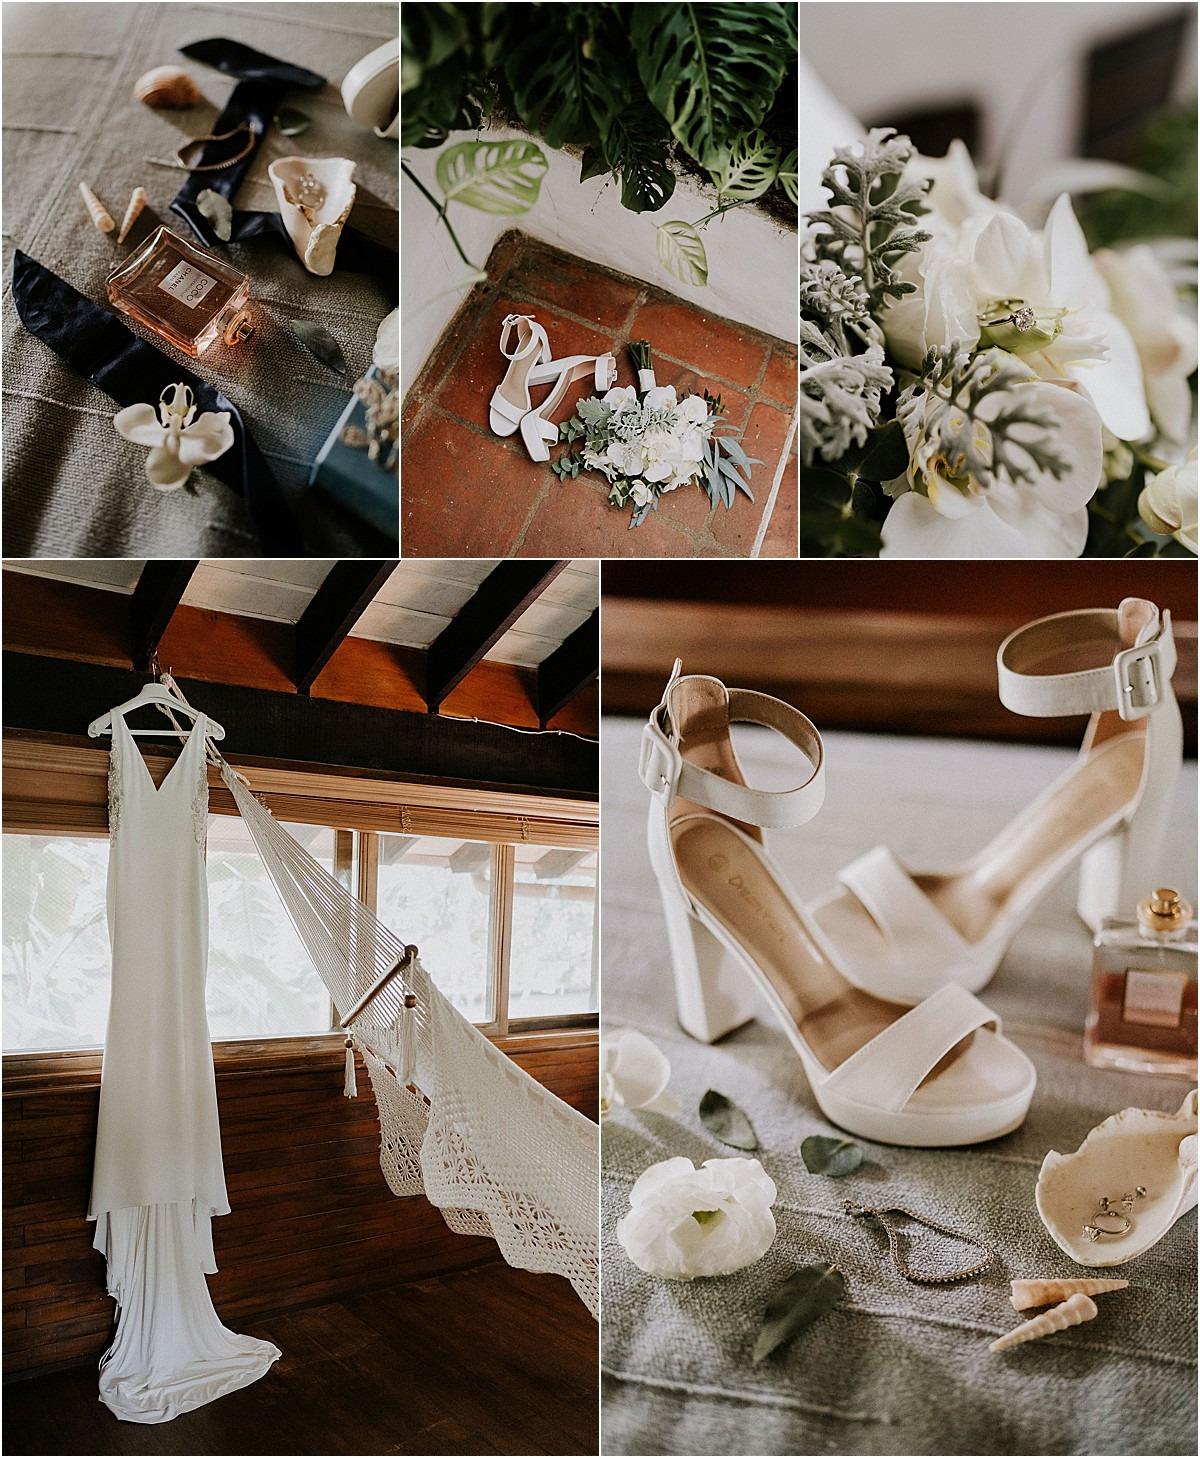 bridal details shoes gown hammock